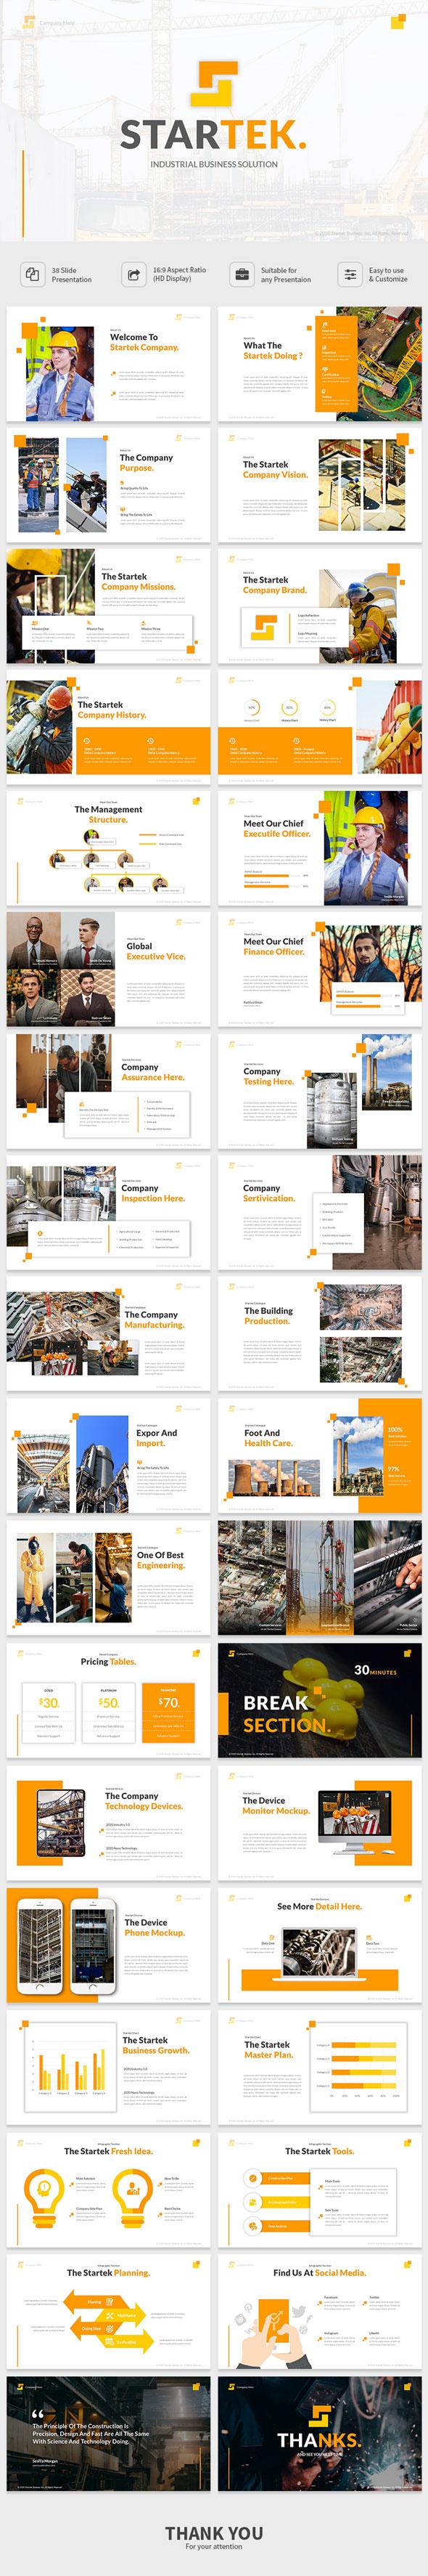 Startek - Powerpoint Industrial Business Solution Presentation